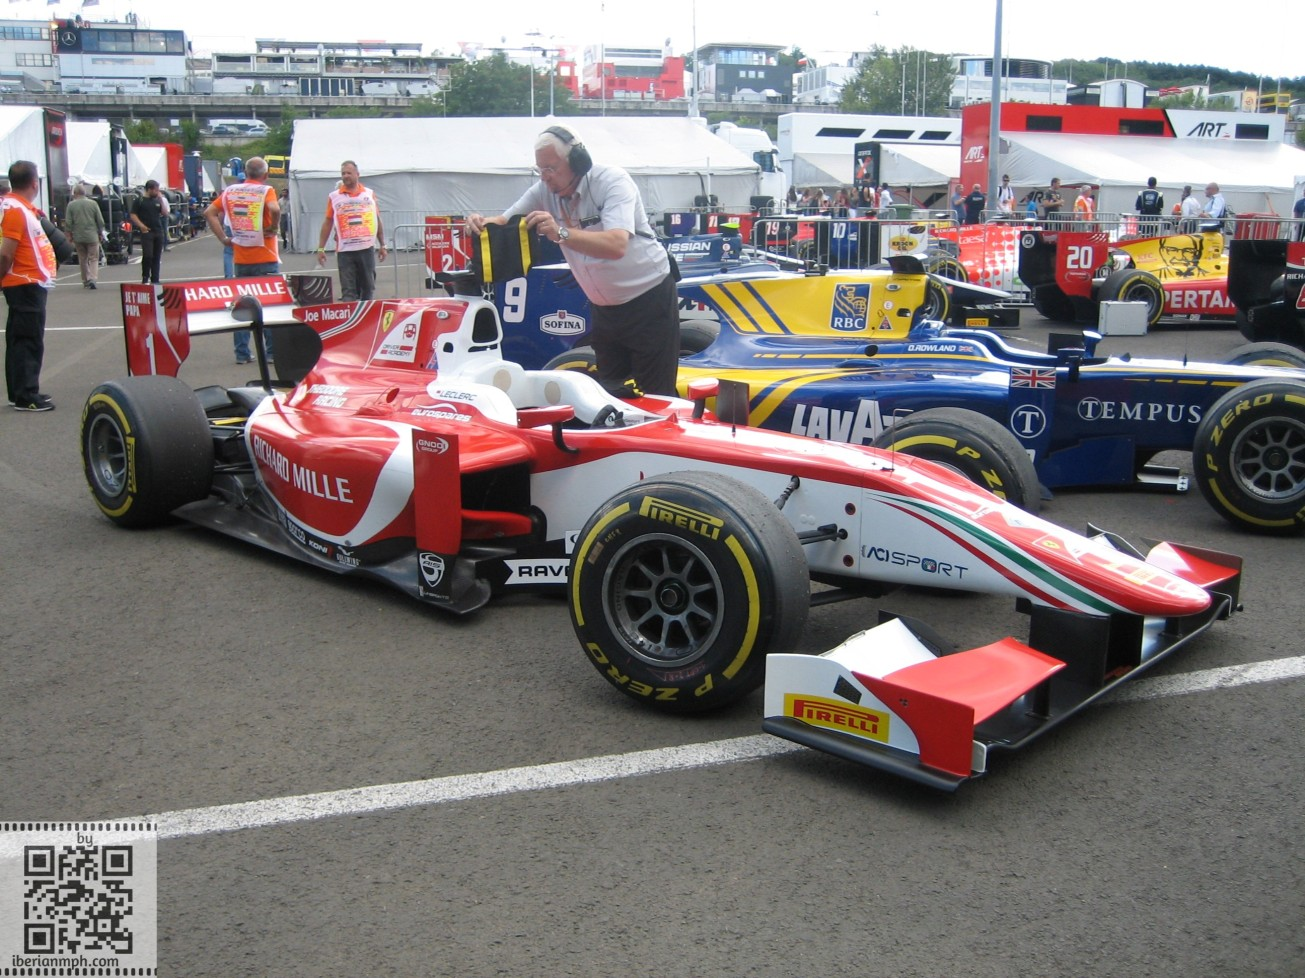 Hungarian GP Formula 2 and GP3 by Sergio (34)